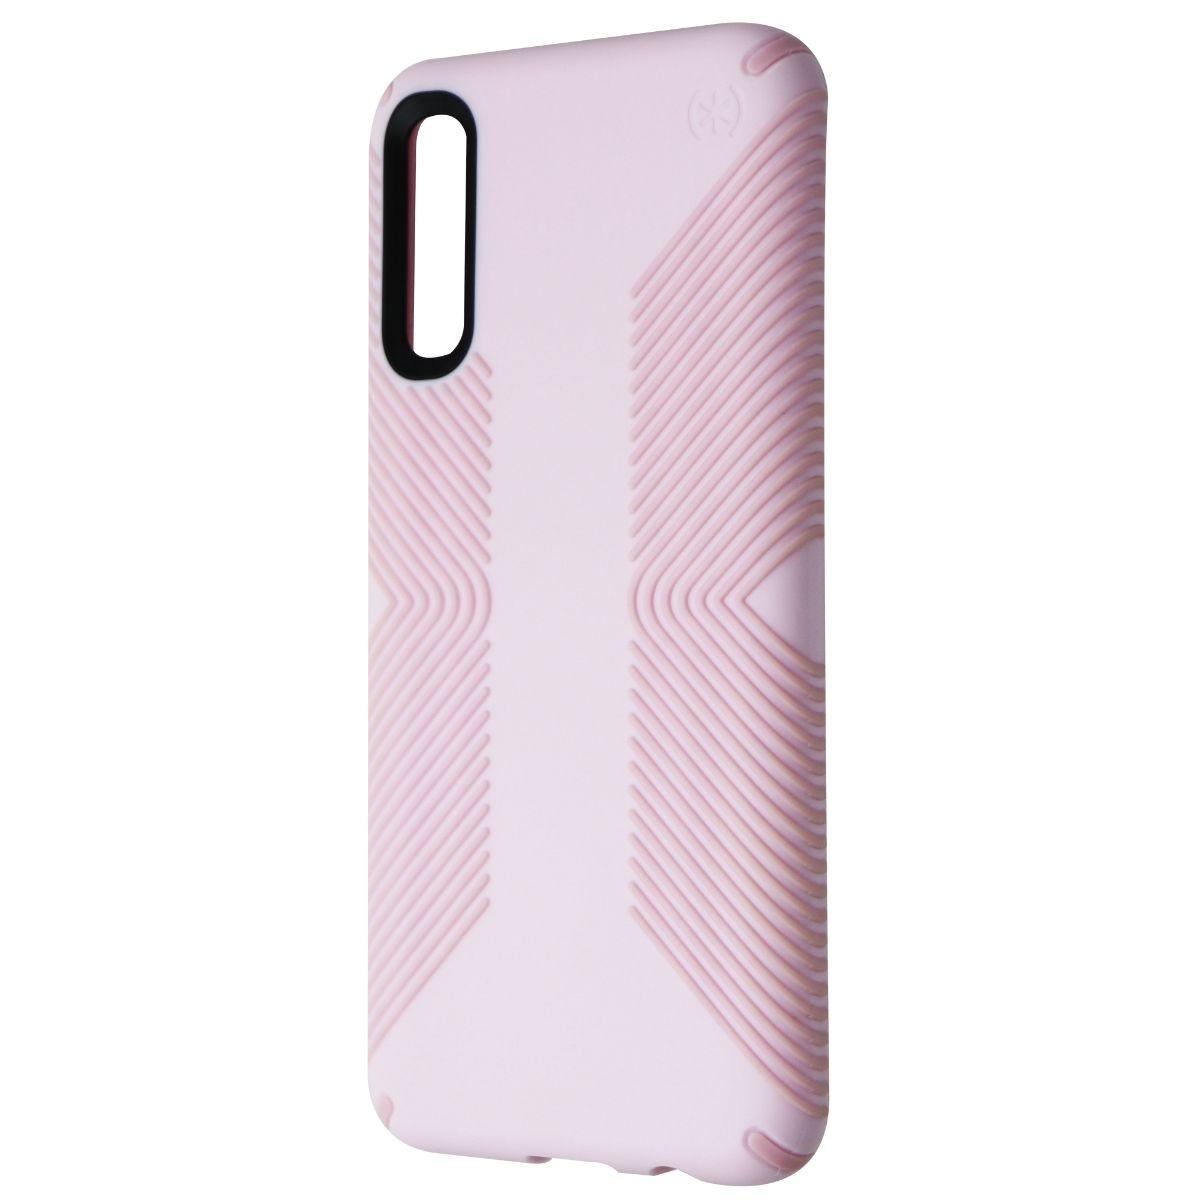 Speck Presidio Grip Hybrid Case for Samsung Galaxy A50 - Ballet Pink/Ribbon Pink